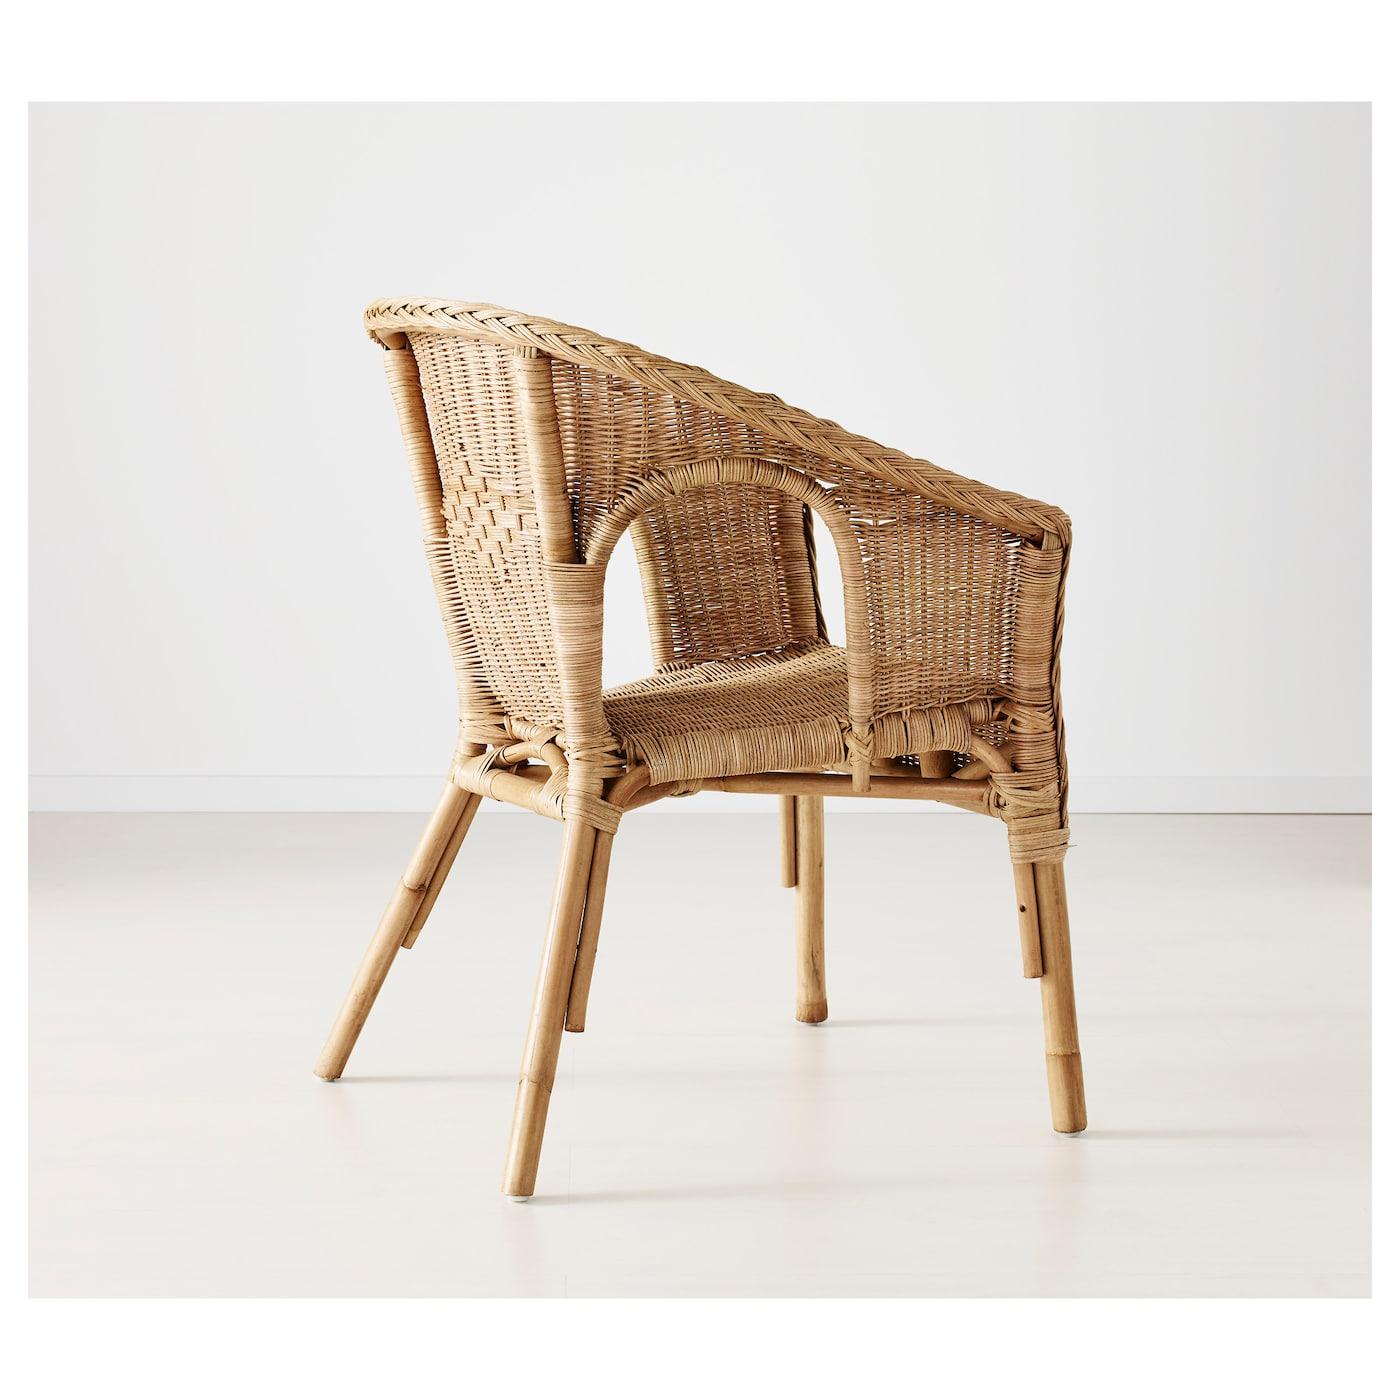 agen chair rattan/bamboo - ikea